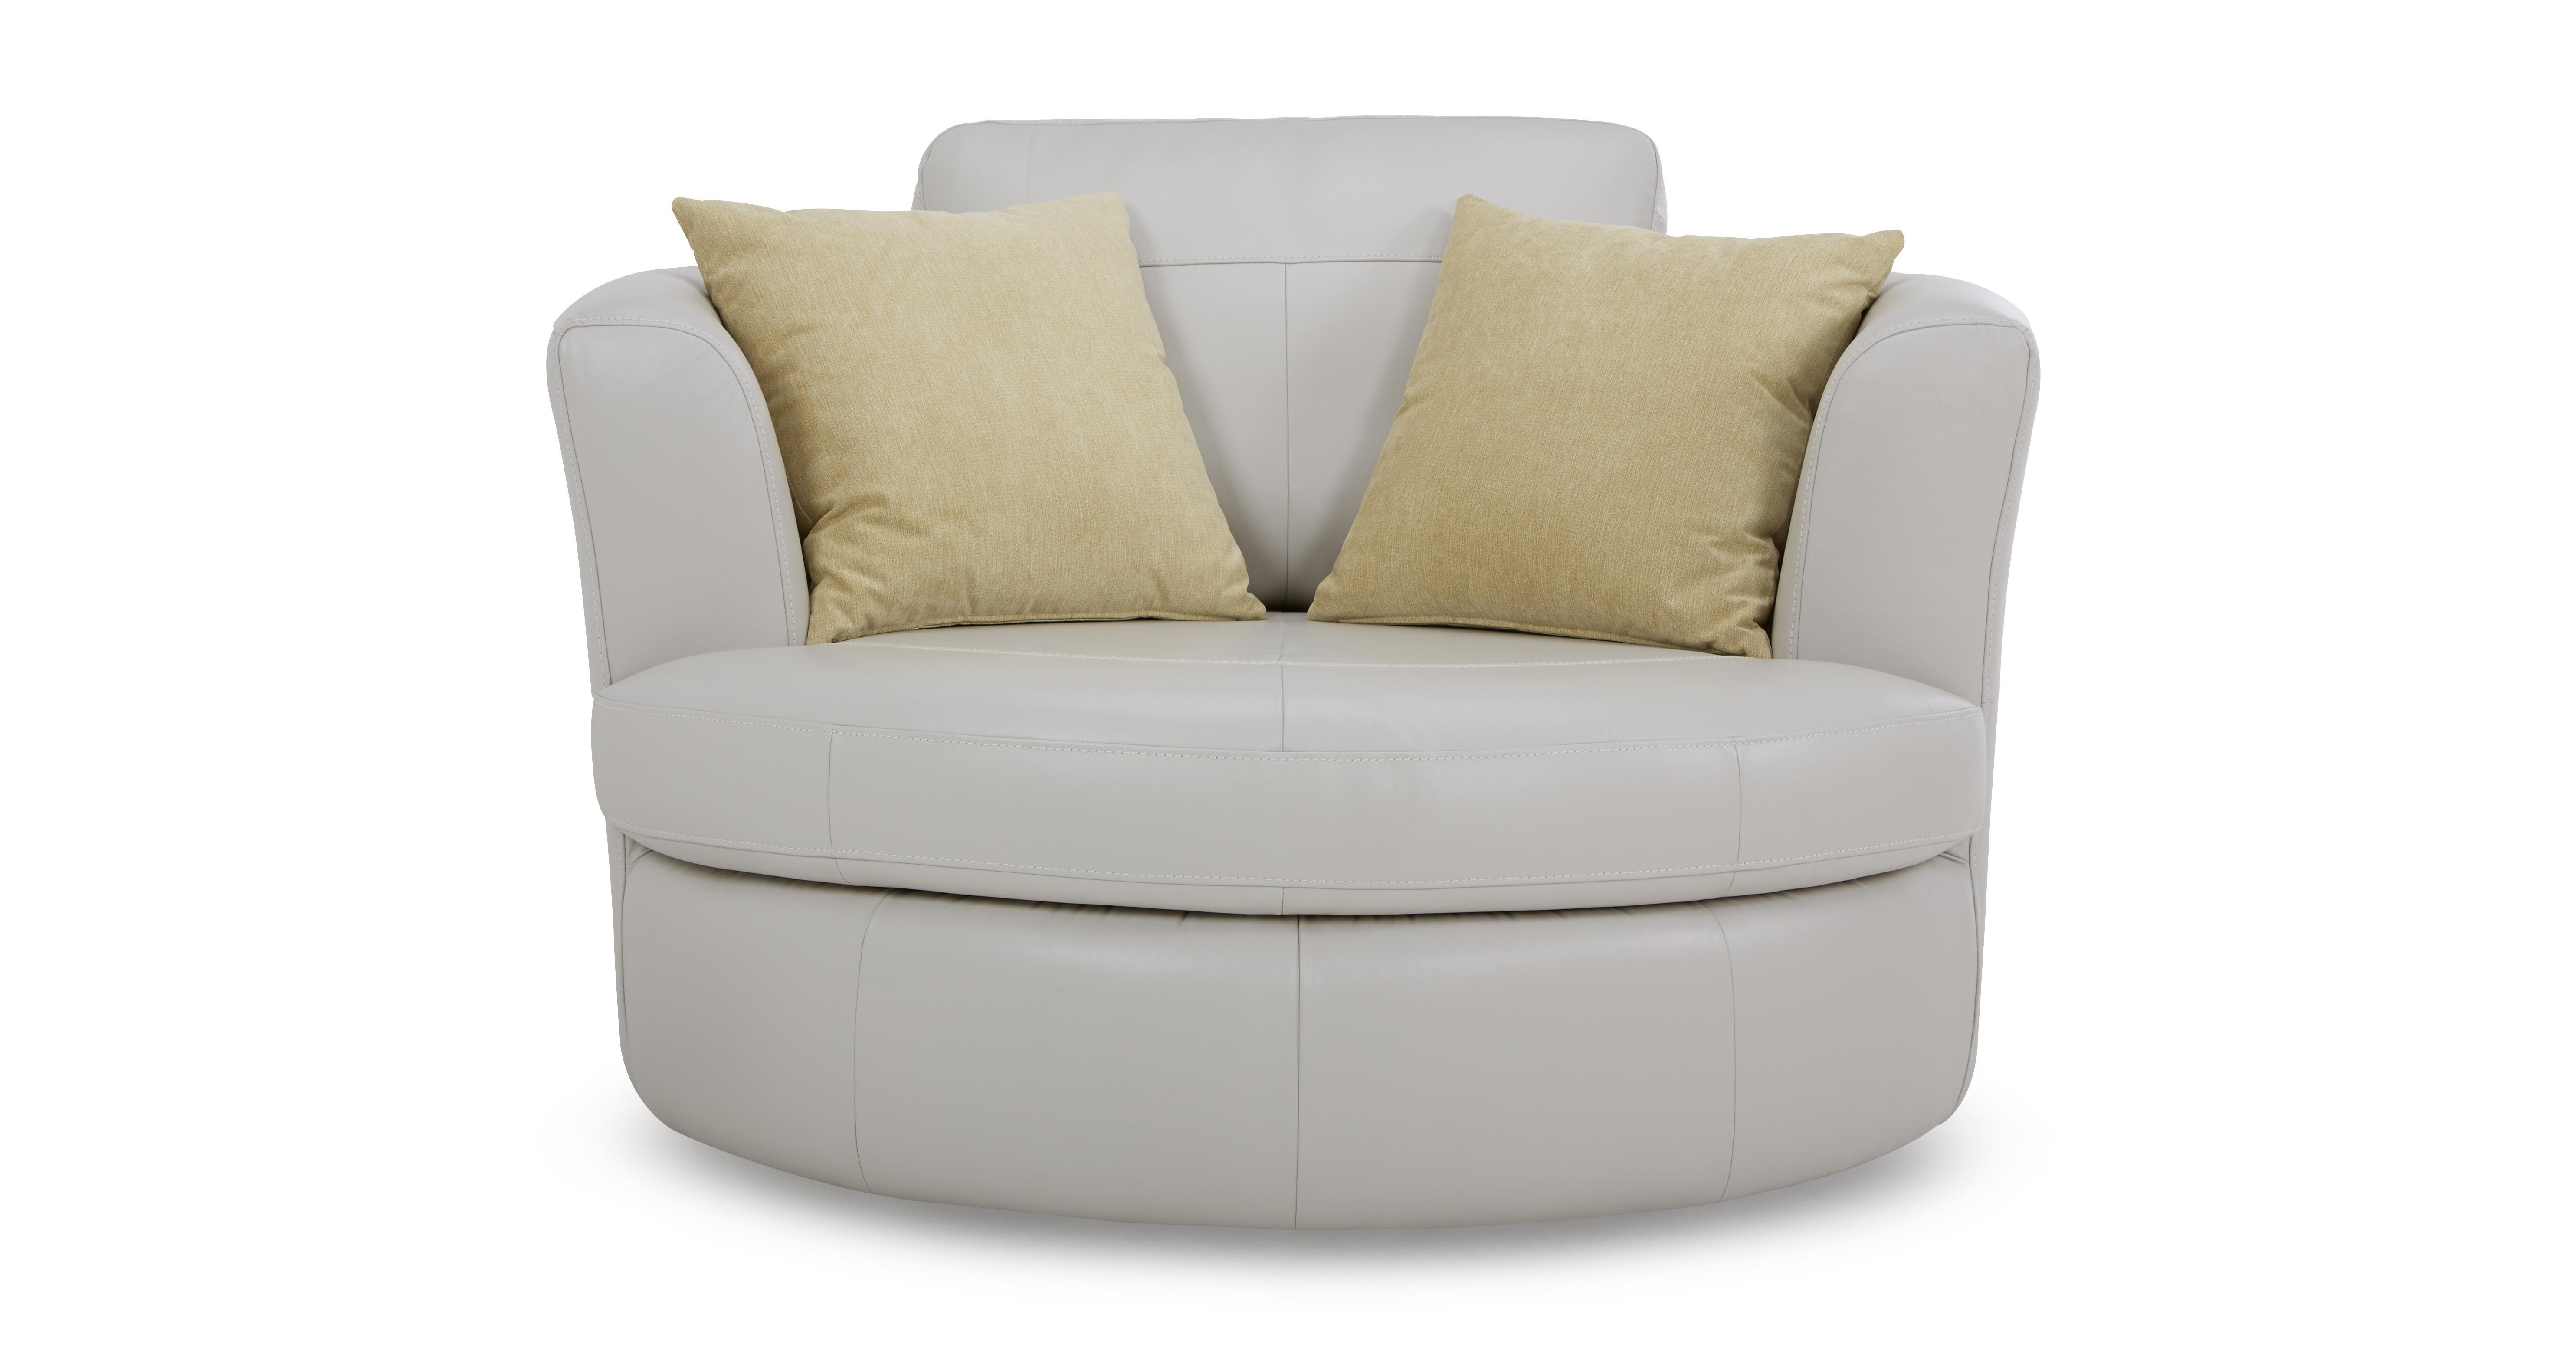 Freya Leather Large Swivel Chair Beau  DFS